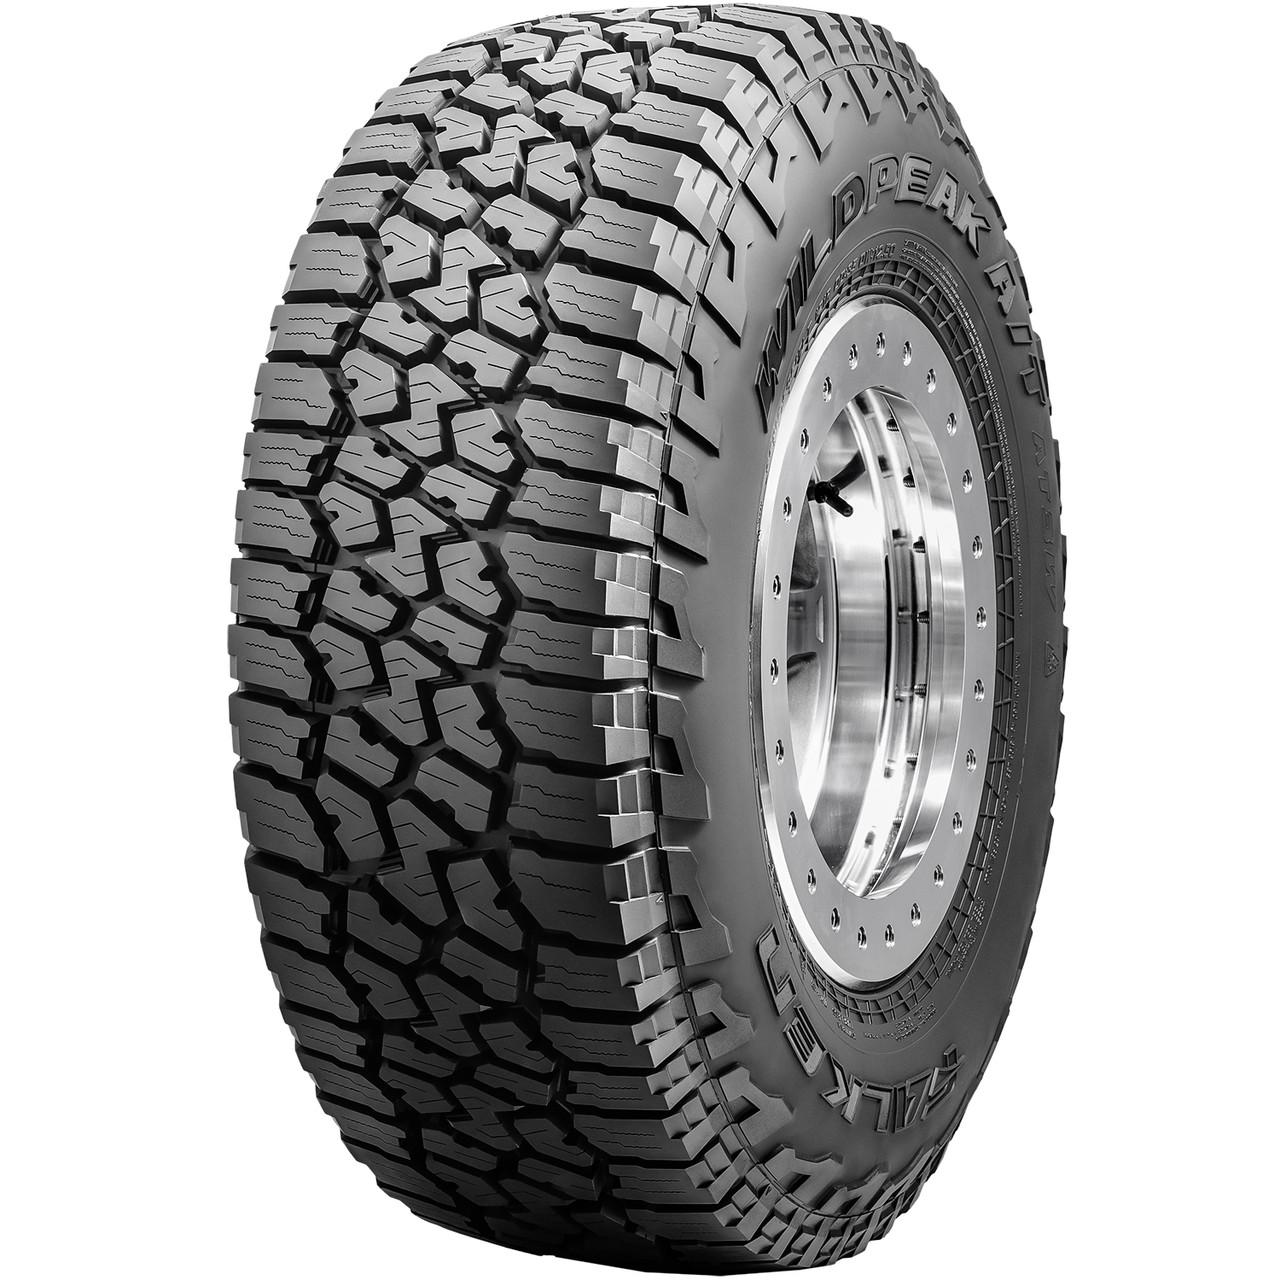 PriorityTire.com coupon: Falken Wildpeak A/T3W 265/75R16 SL All Terrain Tire